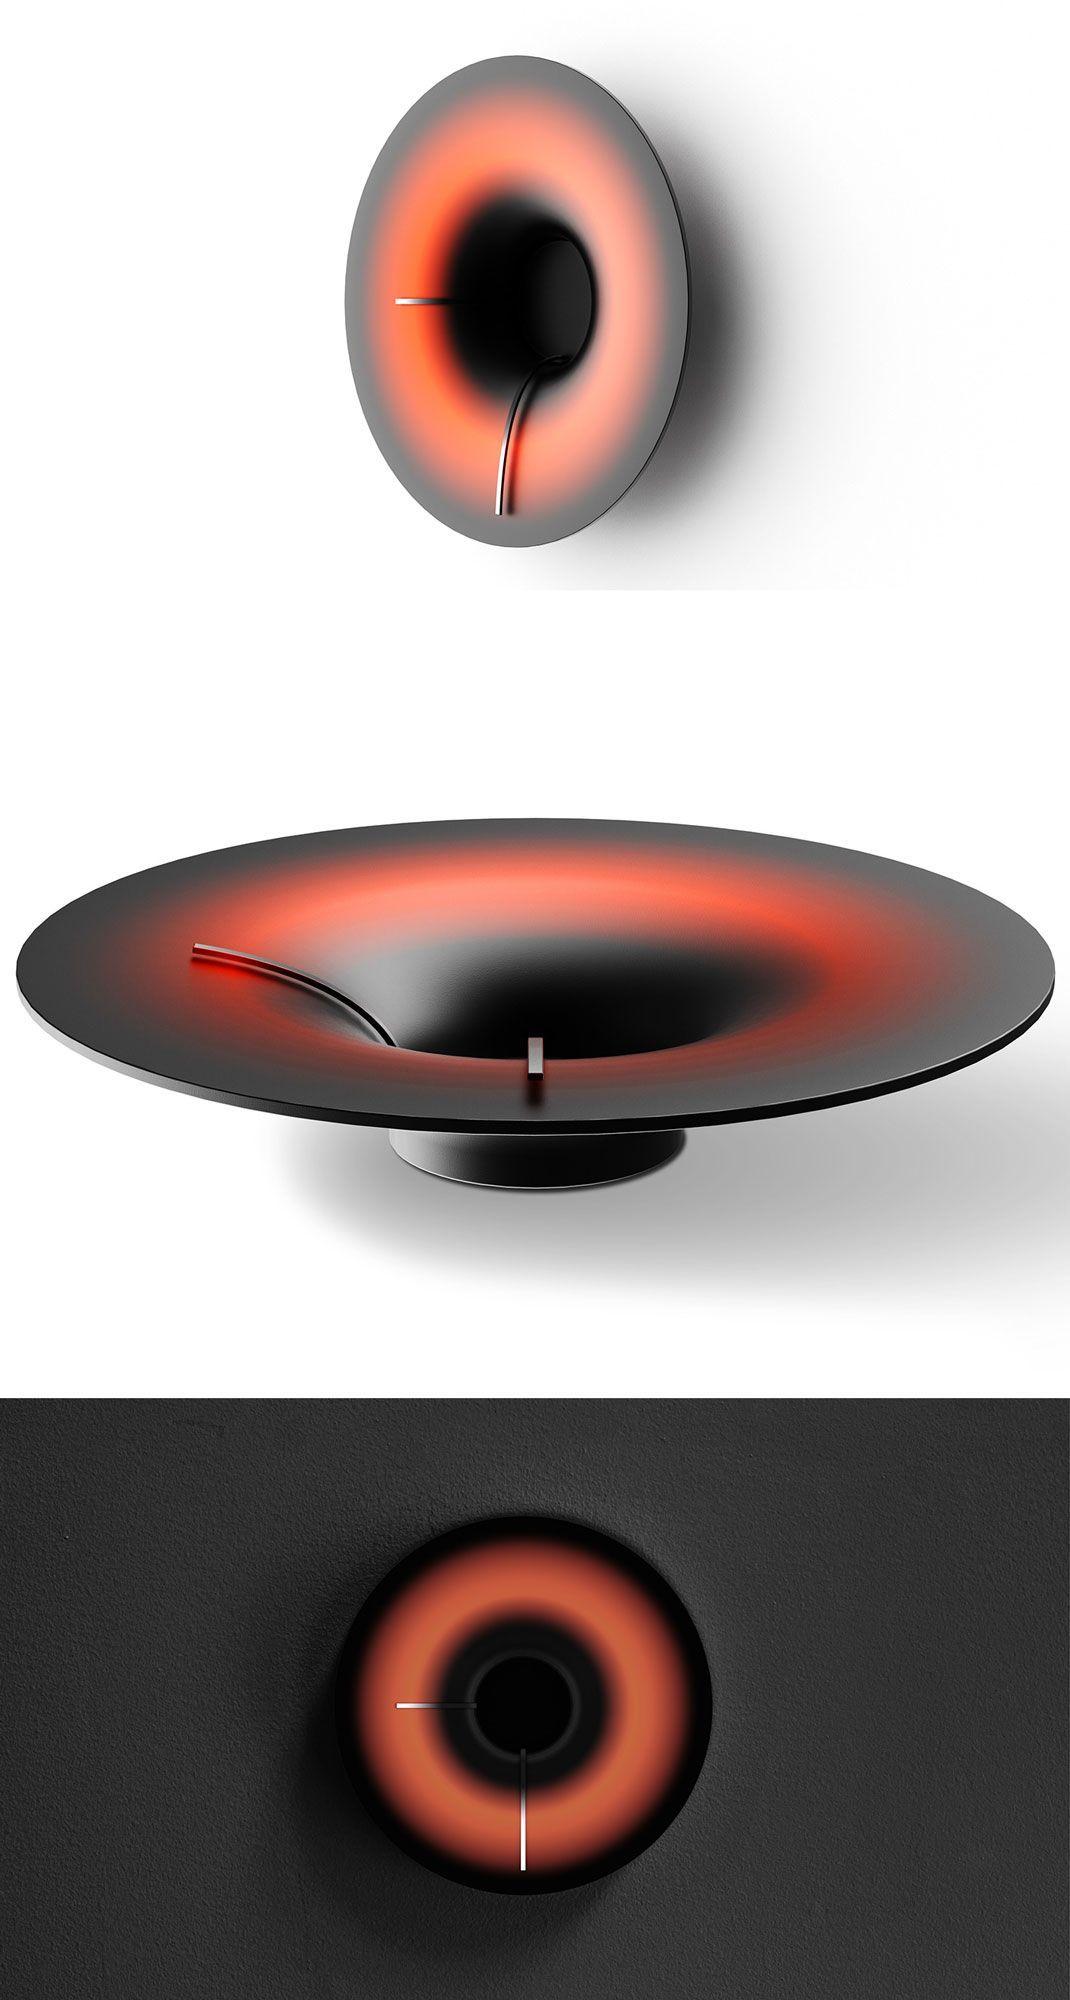 Tim Chen - Black hole clock   Design Inspiration - Industrial design / product design blog #industridesign